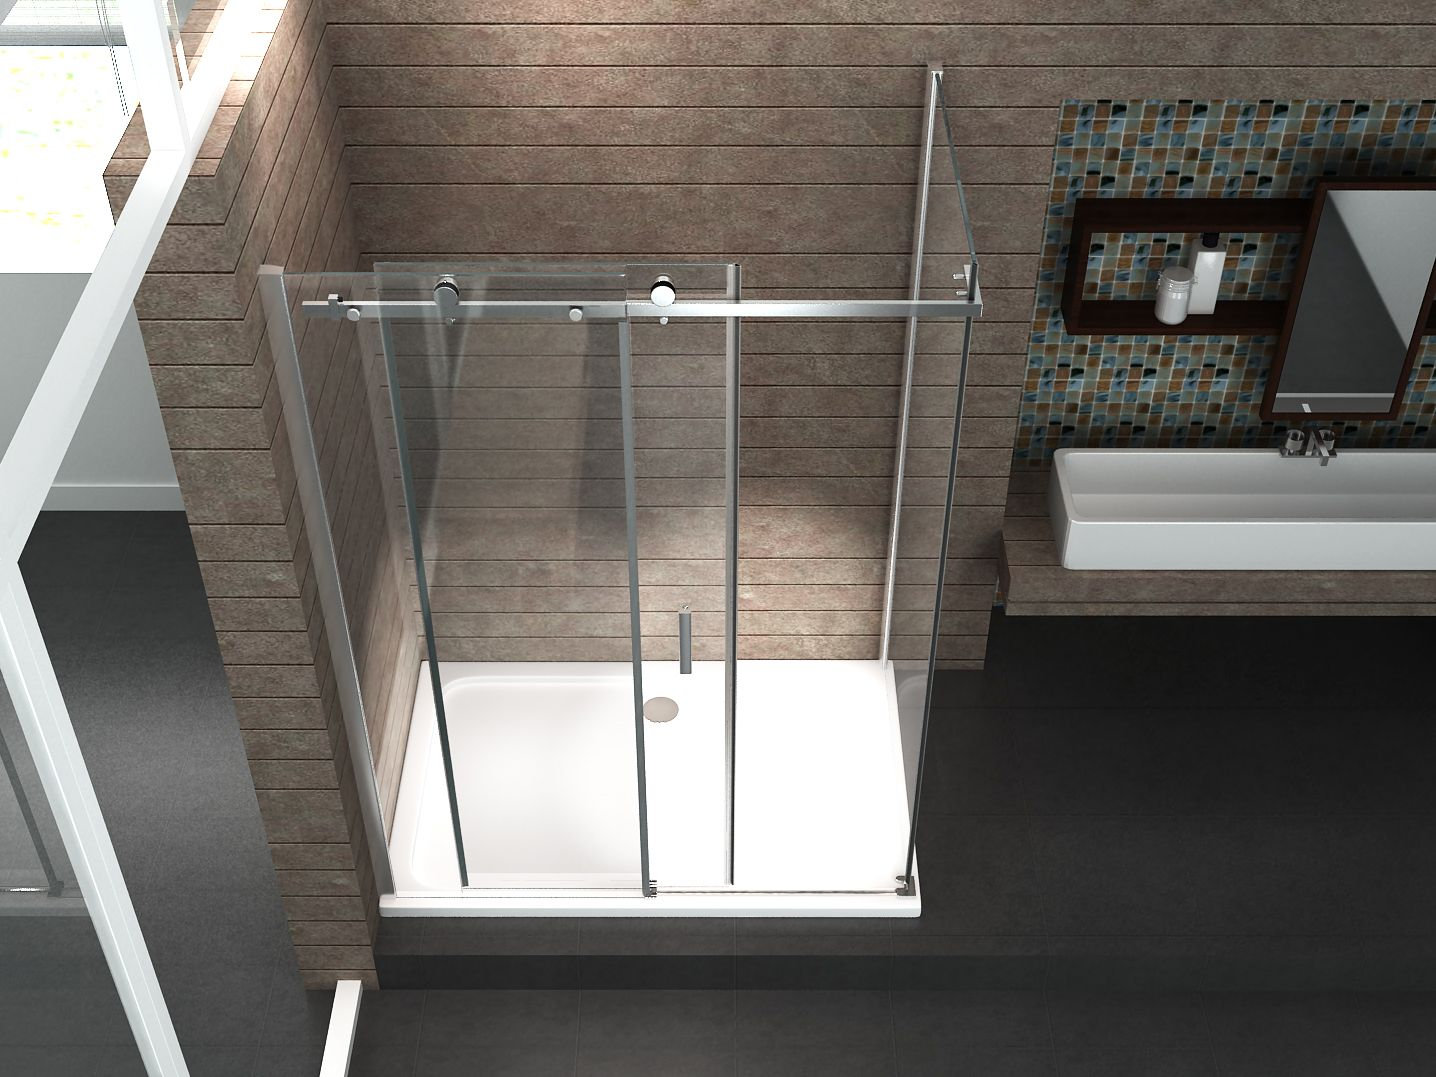 duschkabine tela 120 x 80 x 200 cm inkl duschtasse glasdeals. Black Bedroom Furniture Sets. Home Design Ideas